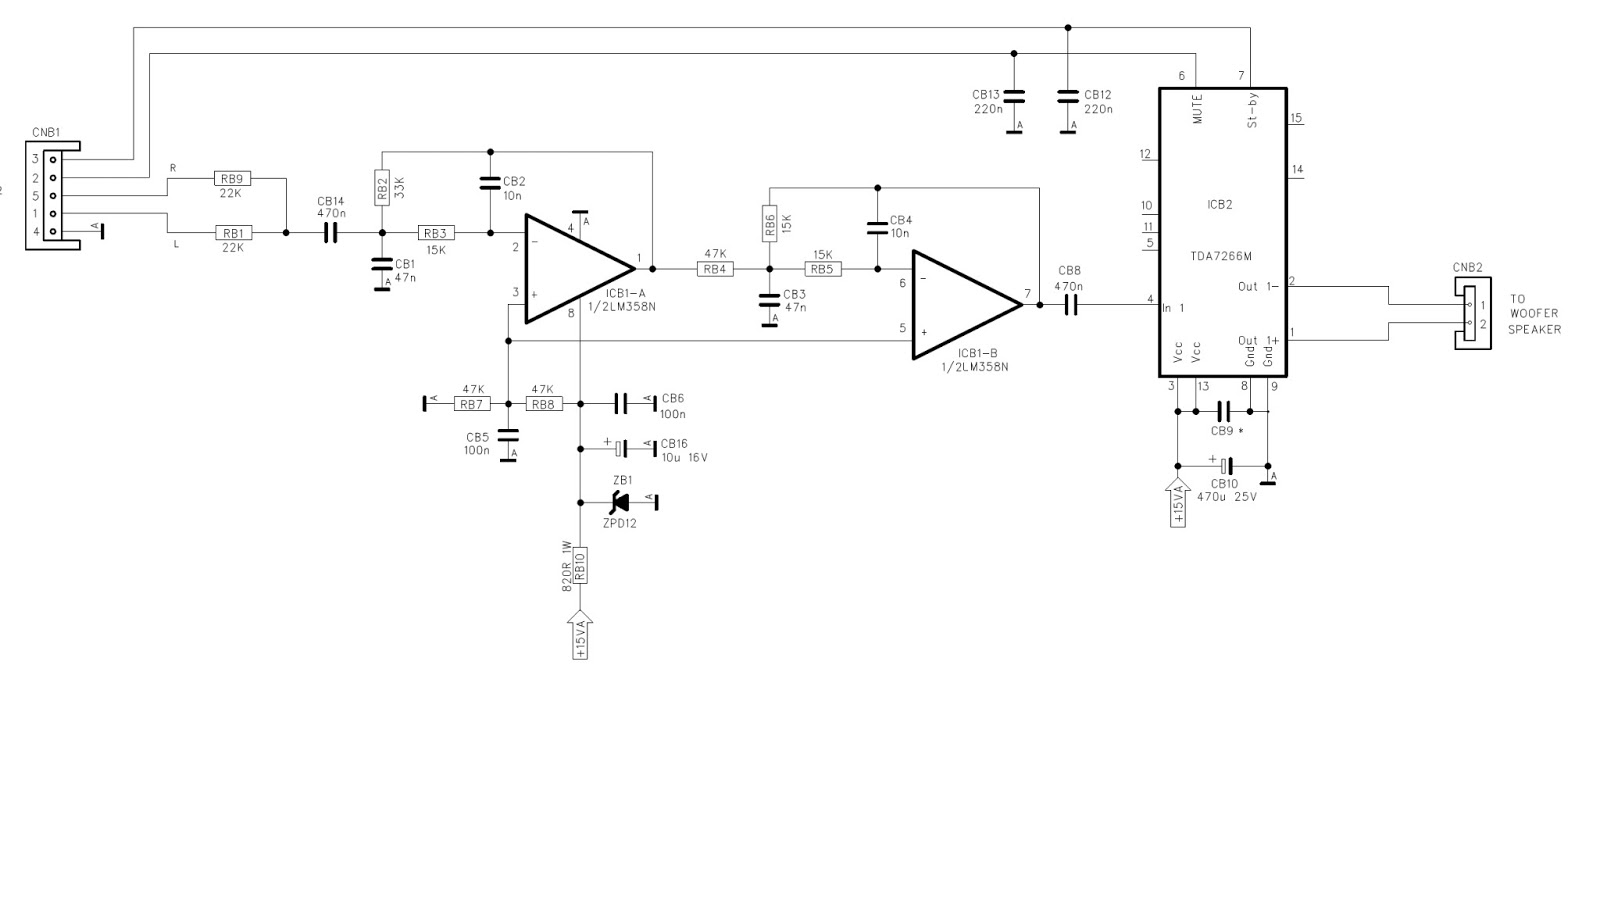 medium resolution of lm358n amplifier circuit woofer amplifier circuit diagram sub woofer circuit woofer circuit diagram electro magnet diagram